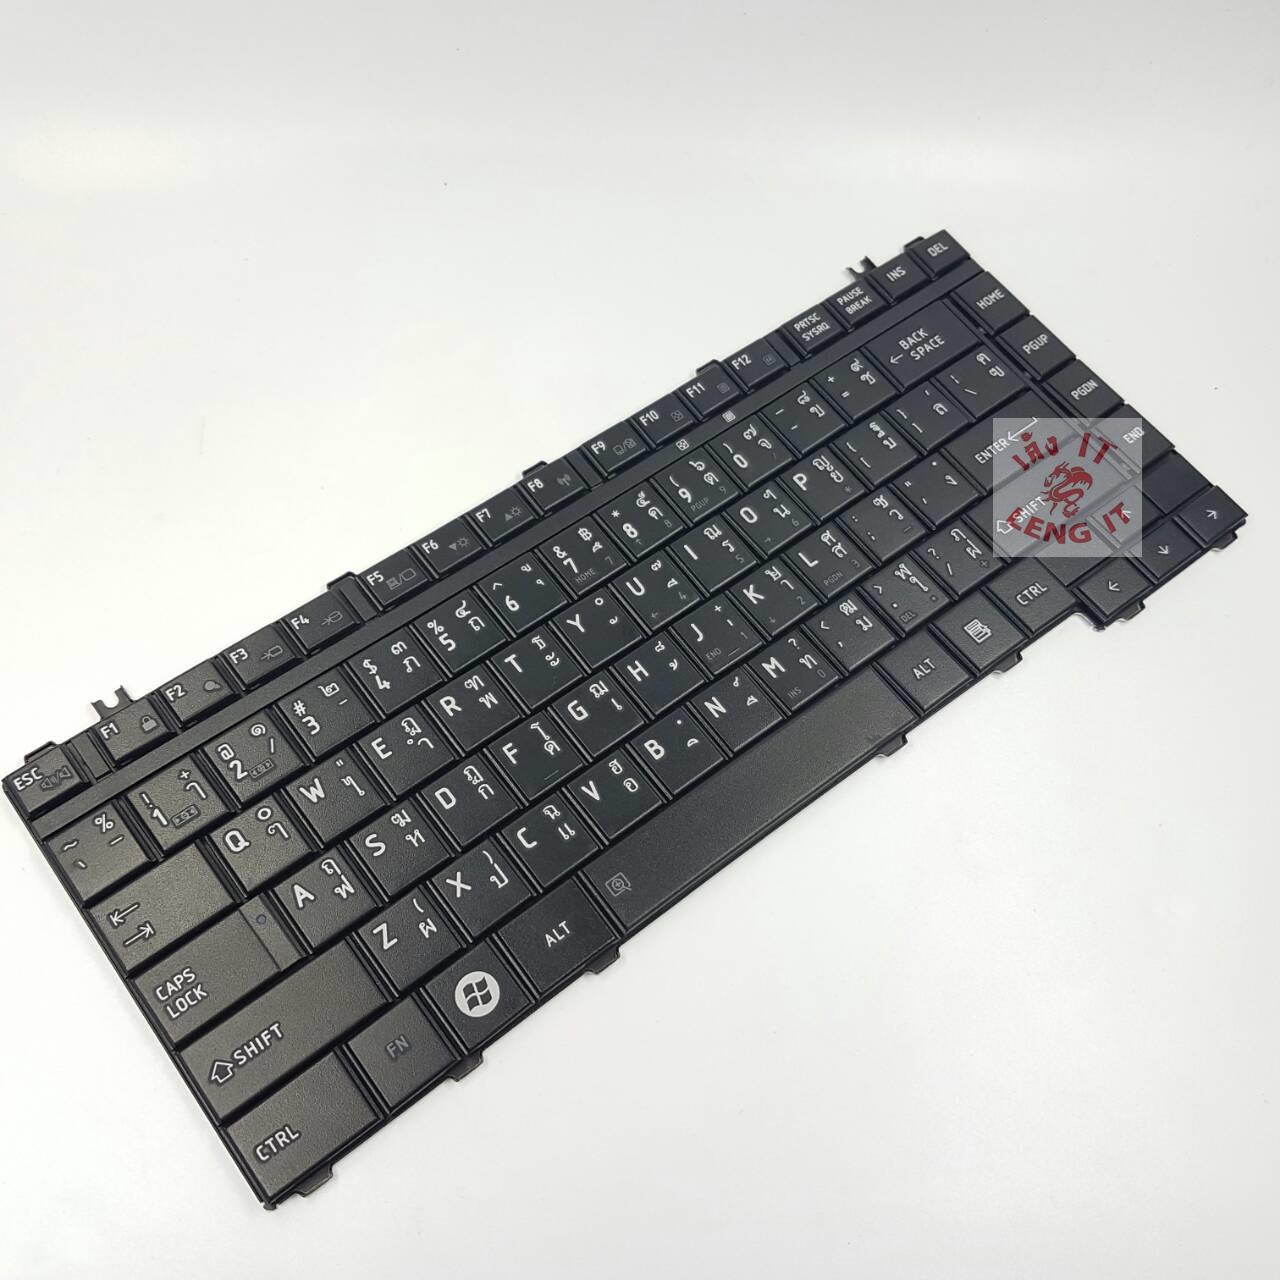 KEYBOARD TOSHIBA M200